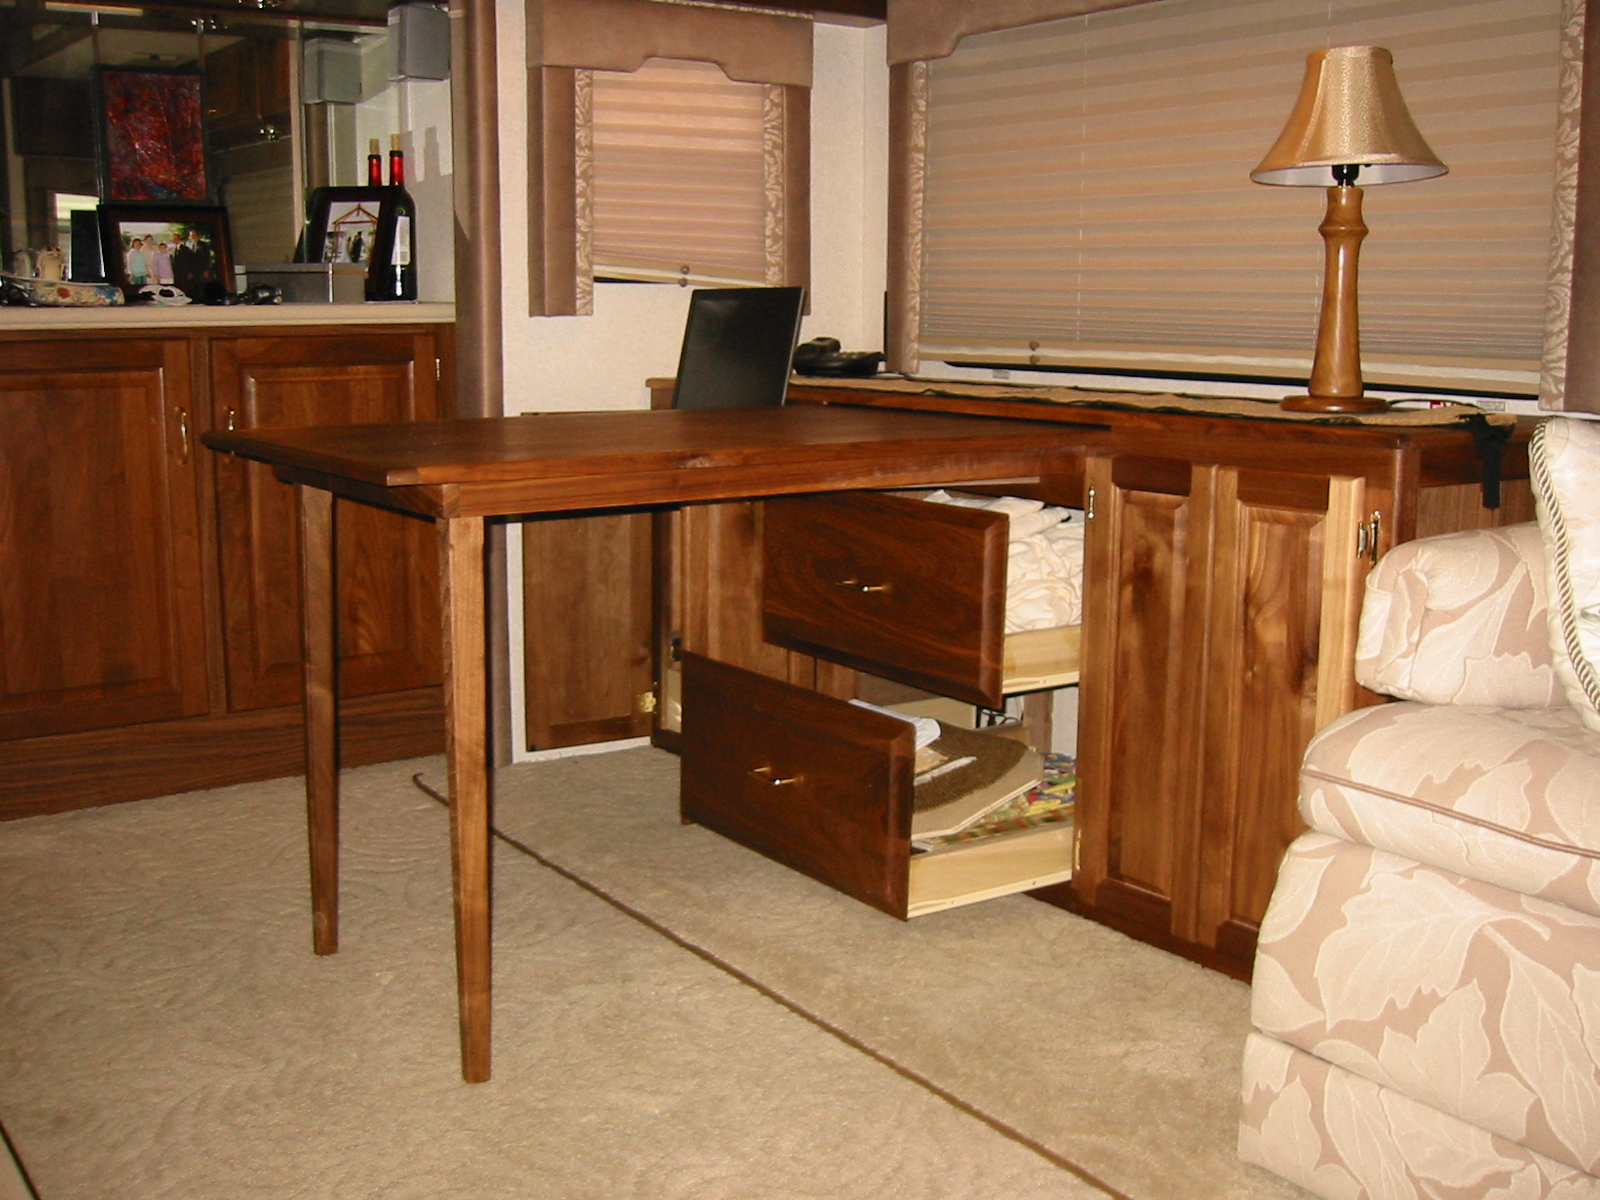 Click image for larger version  Name:RV desk 3.jpg Views:449 Size:846.9 KB ID:51164